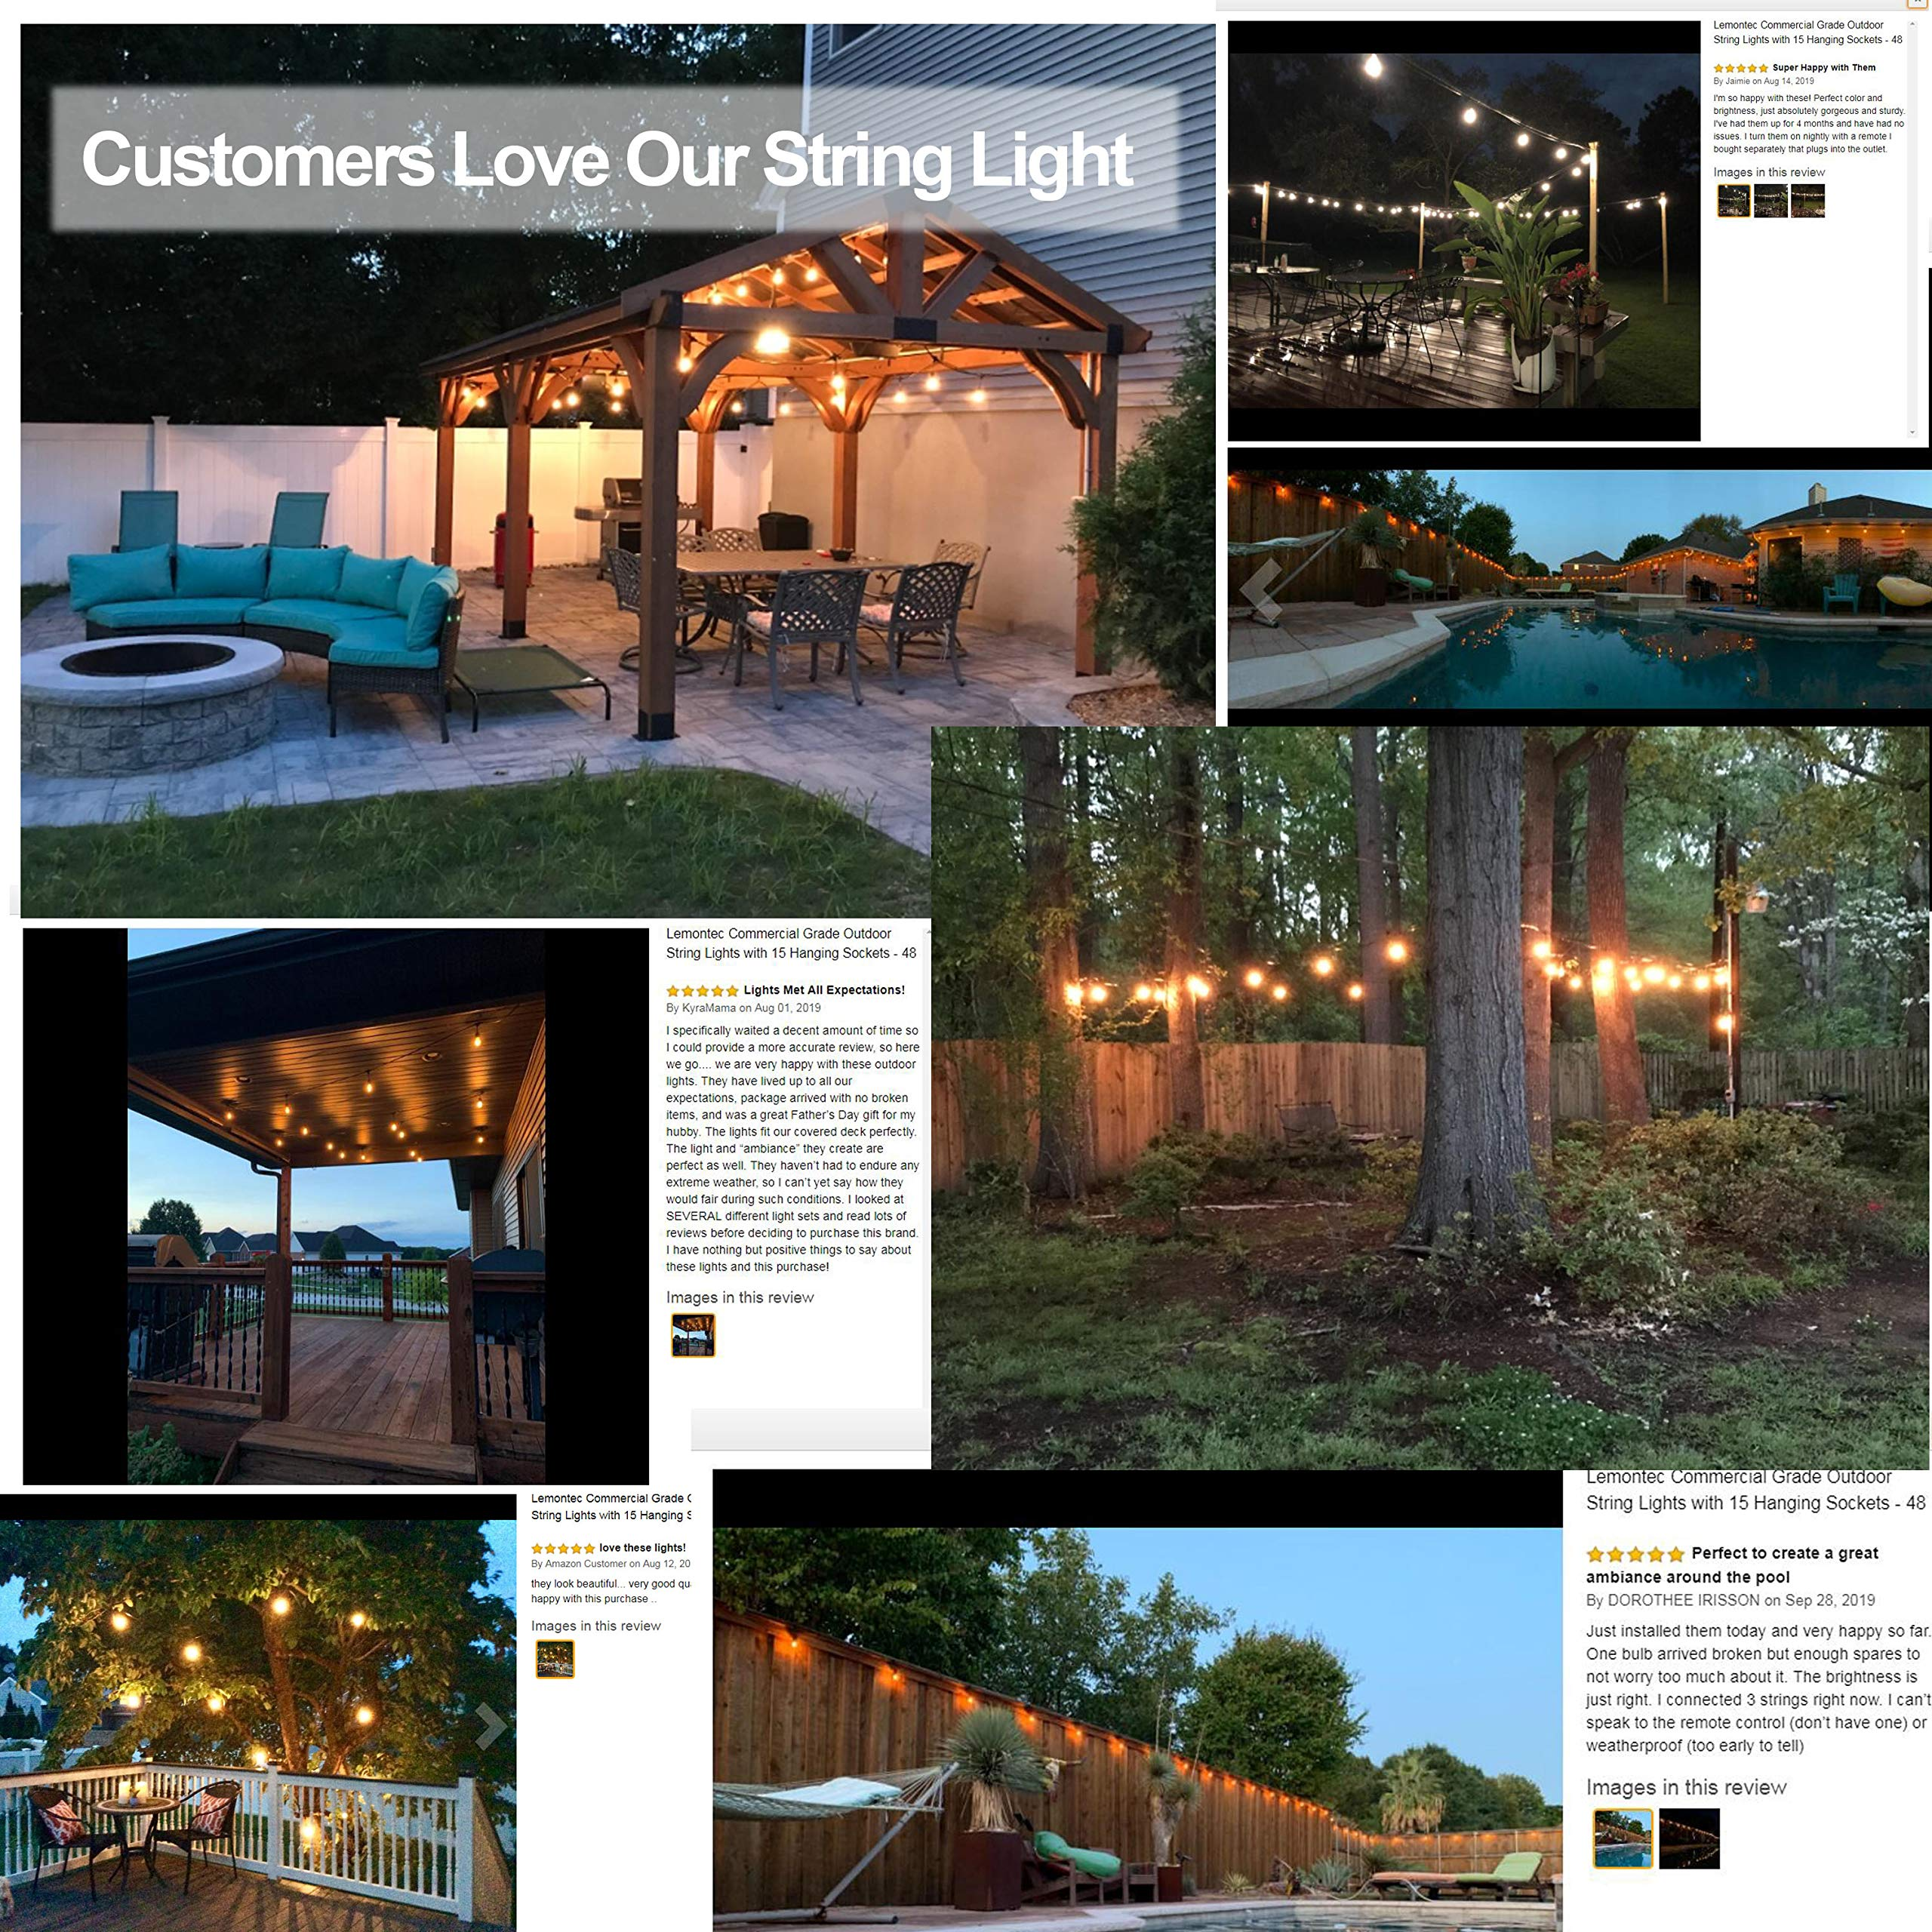 Lemontec Commercial Grade Outdoor String Lights with 15 Hanging Sockets 48 Ft